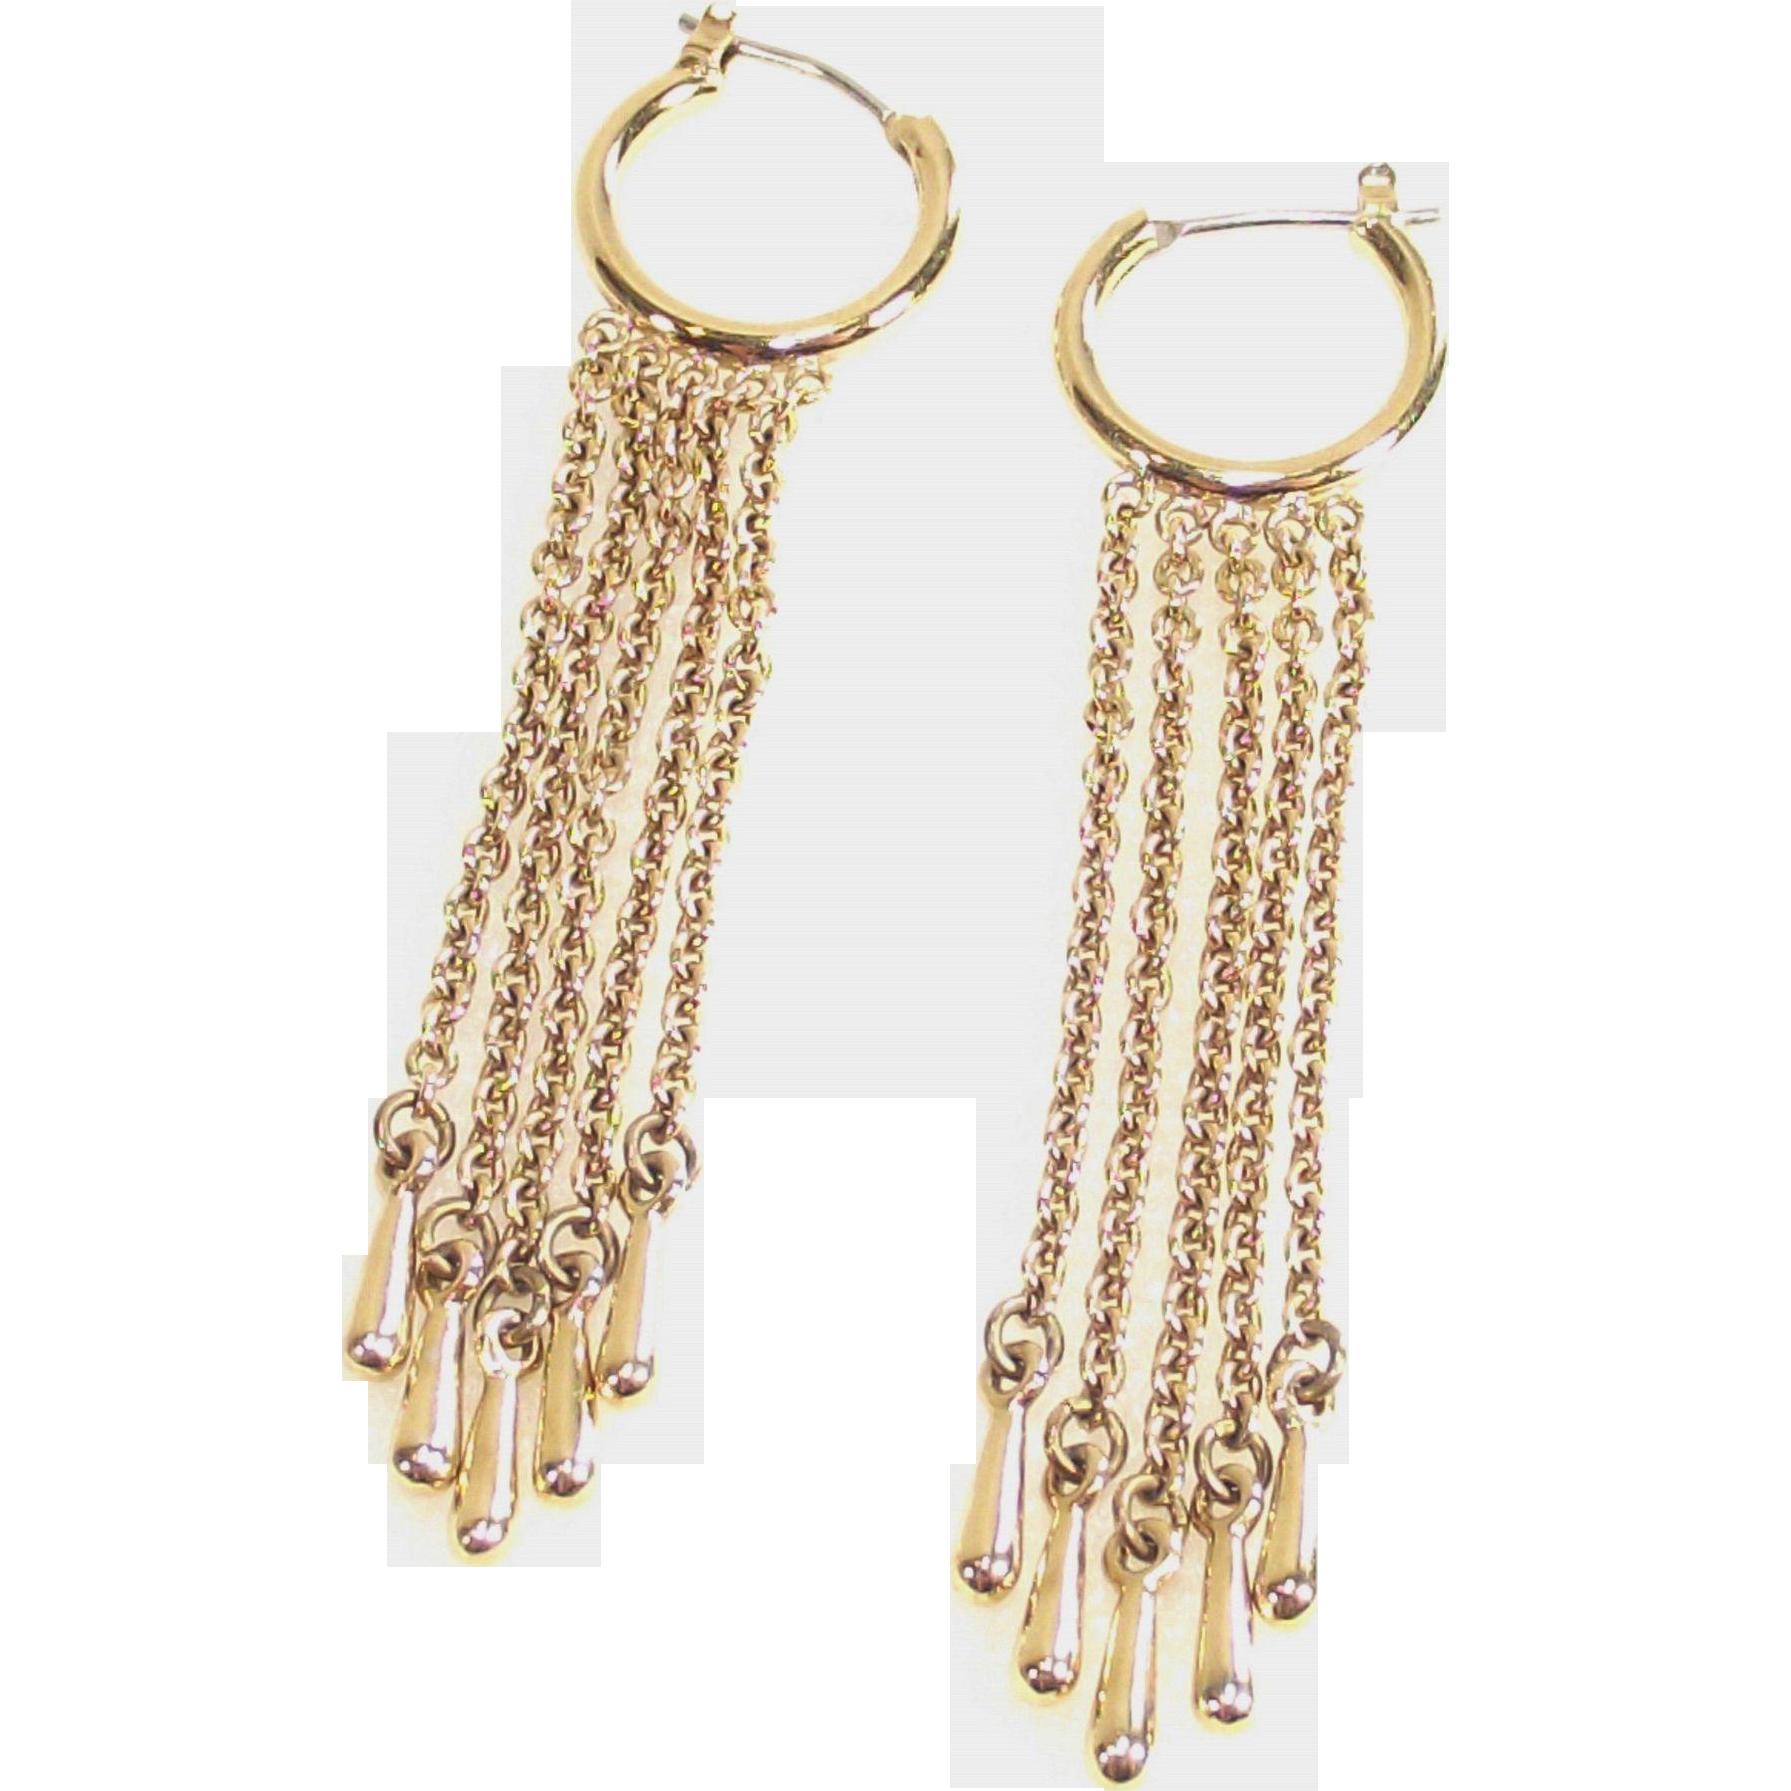 Vintage Gold Tone Demi Hoop Earrings with Long Fringe